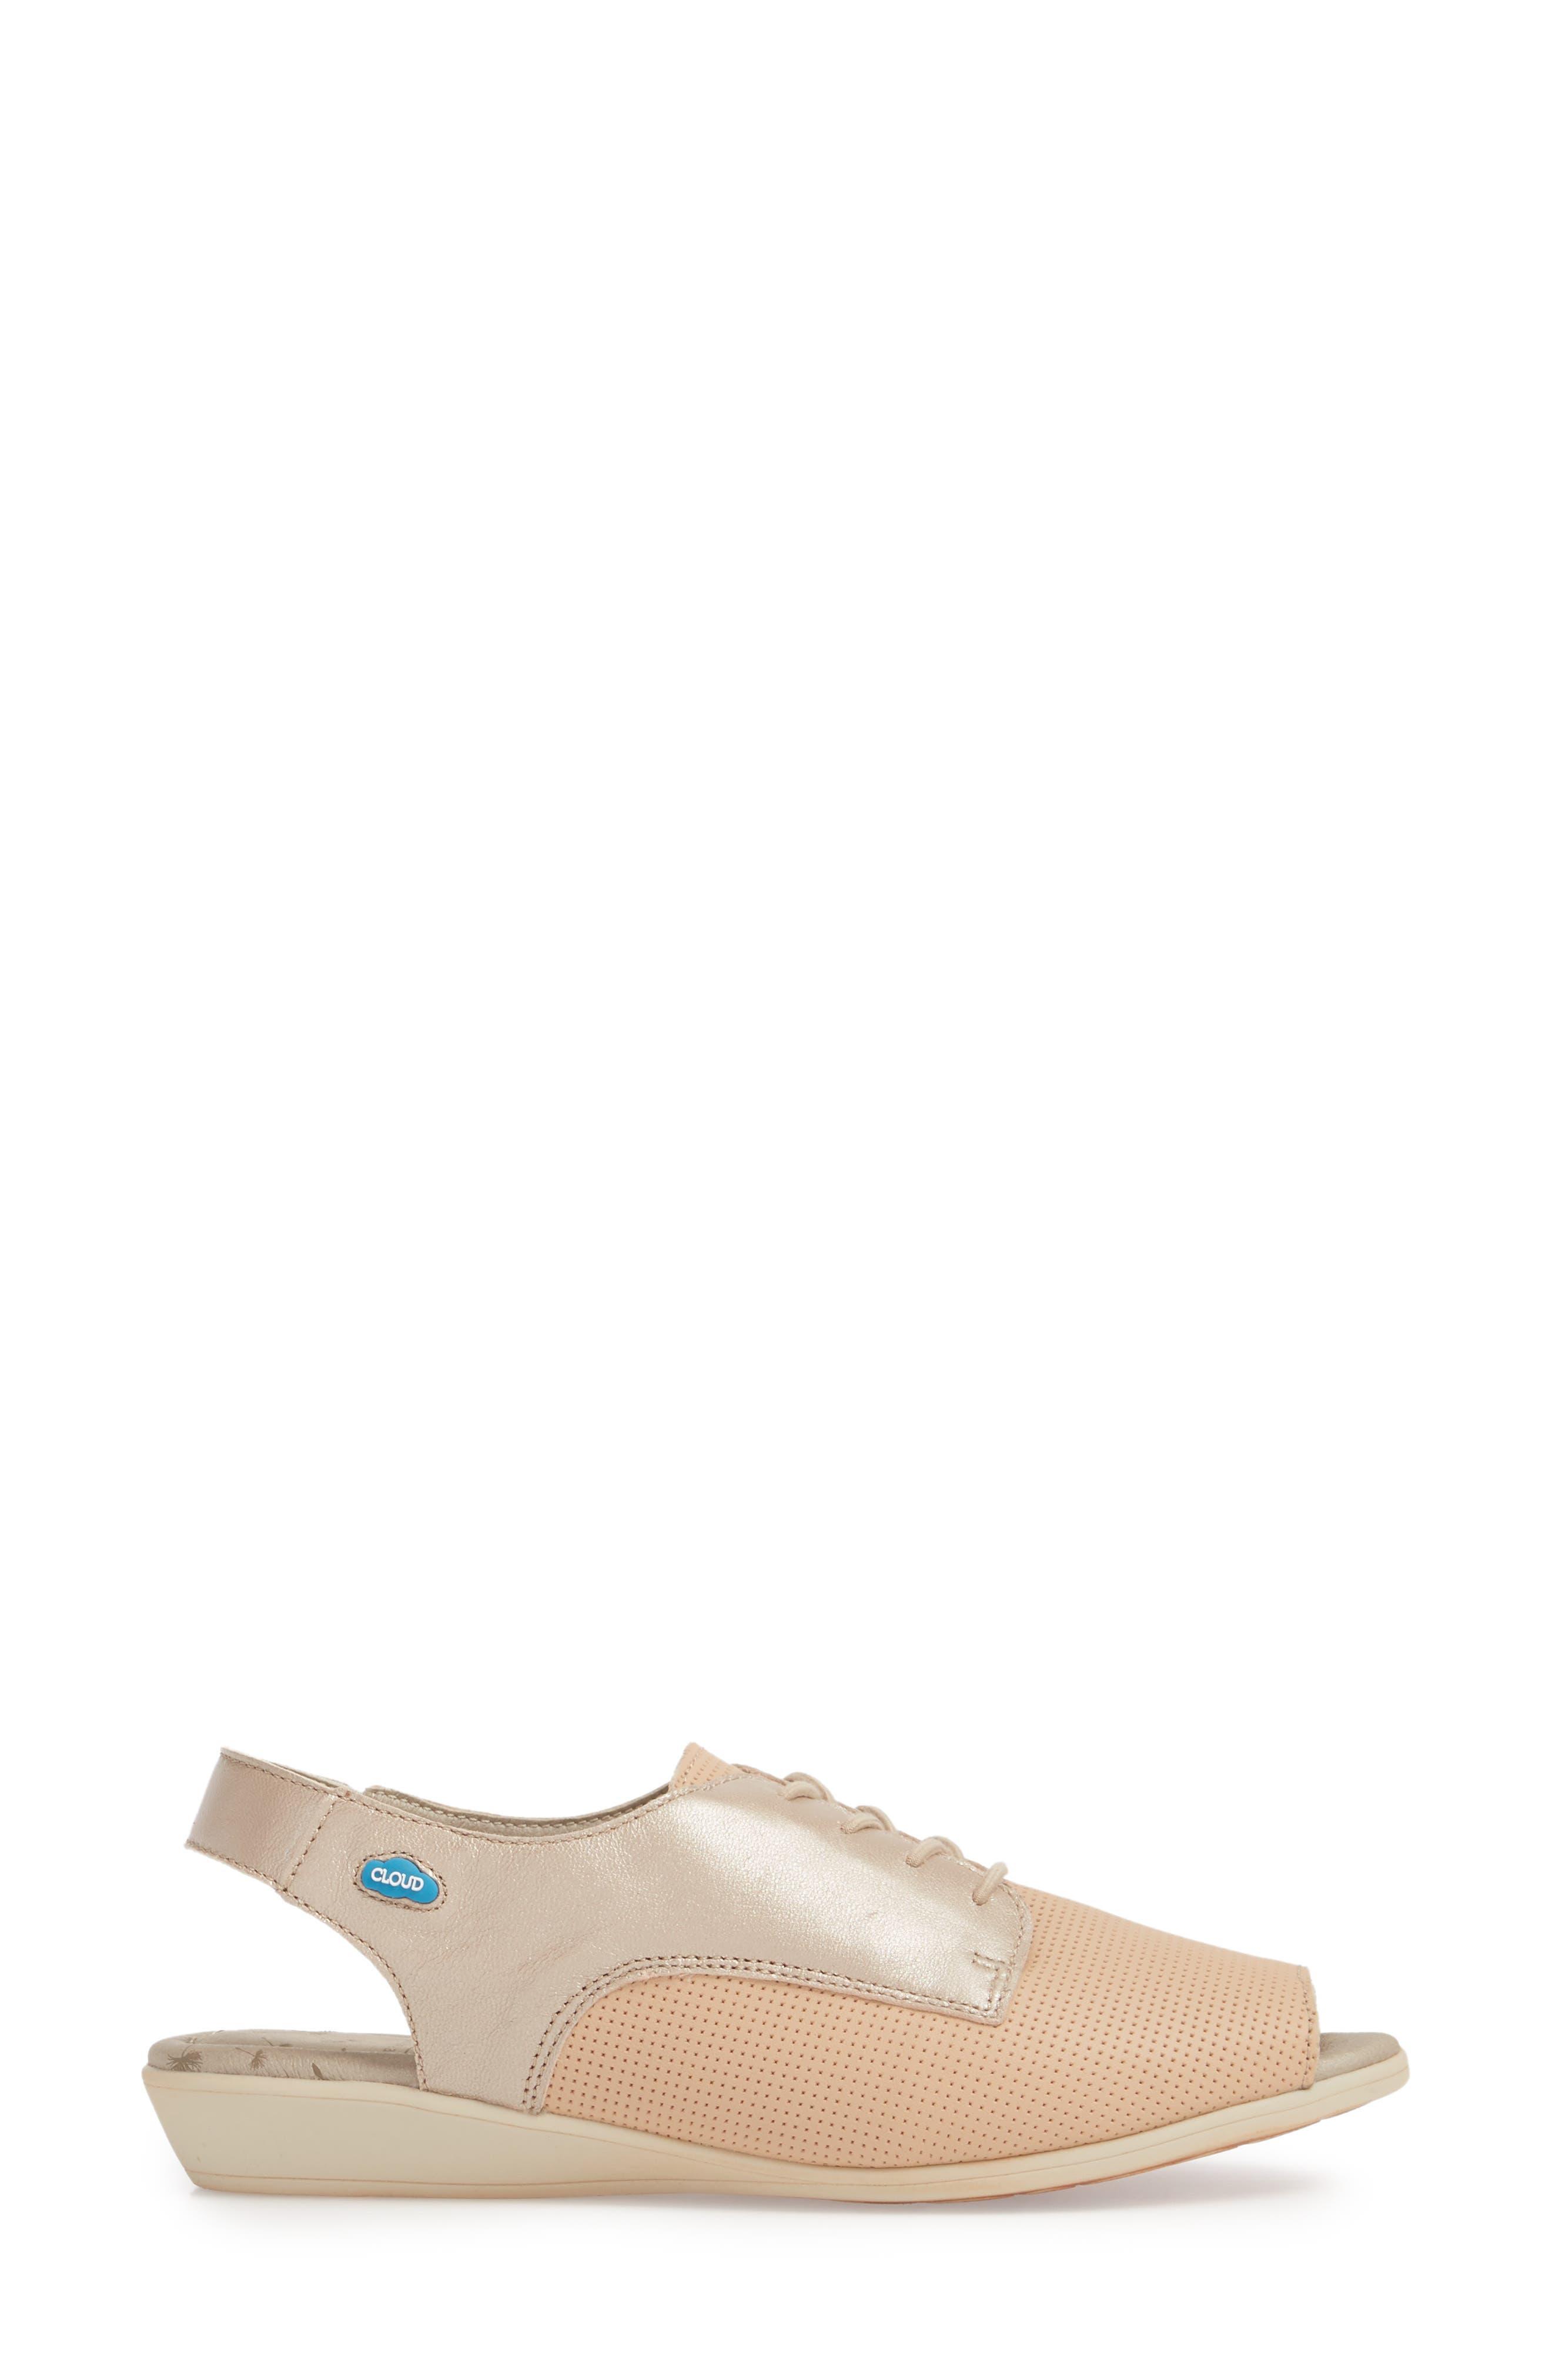 Cleone Slingback Sandal,                             Alternate thumbnail 3, color,                             Puima Sabbia Leather